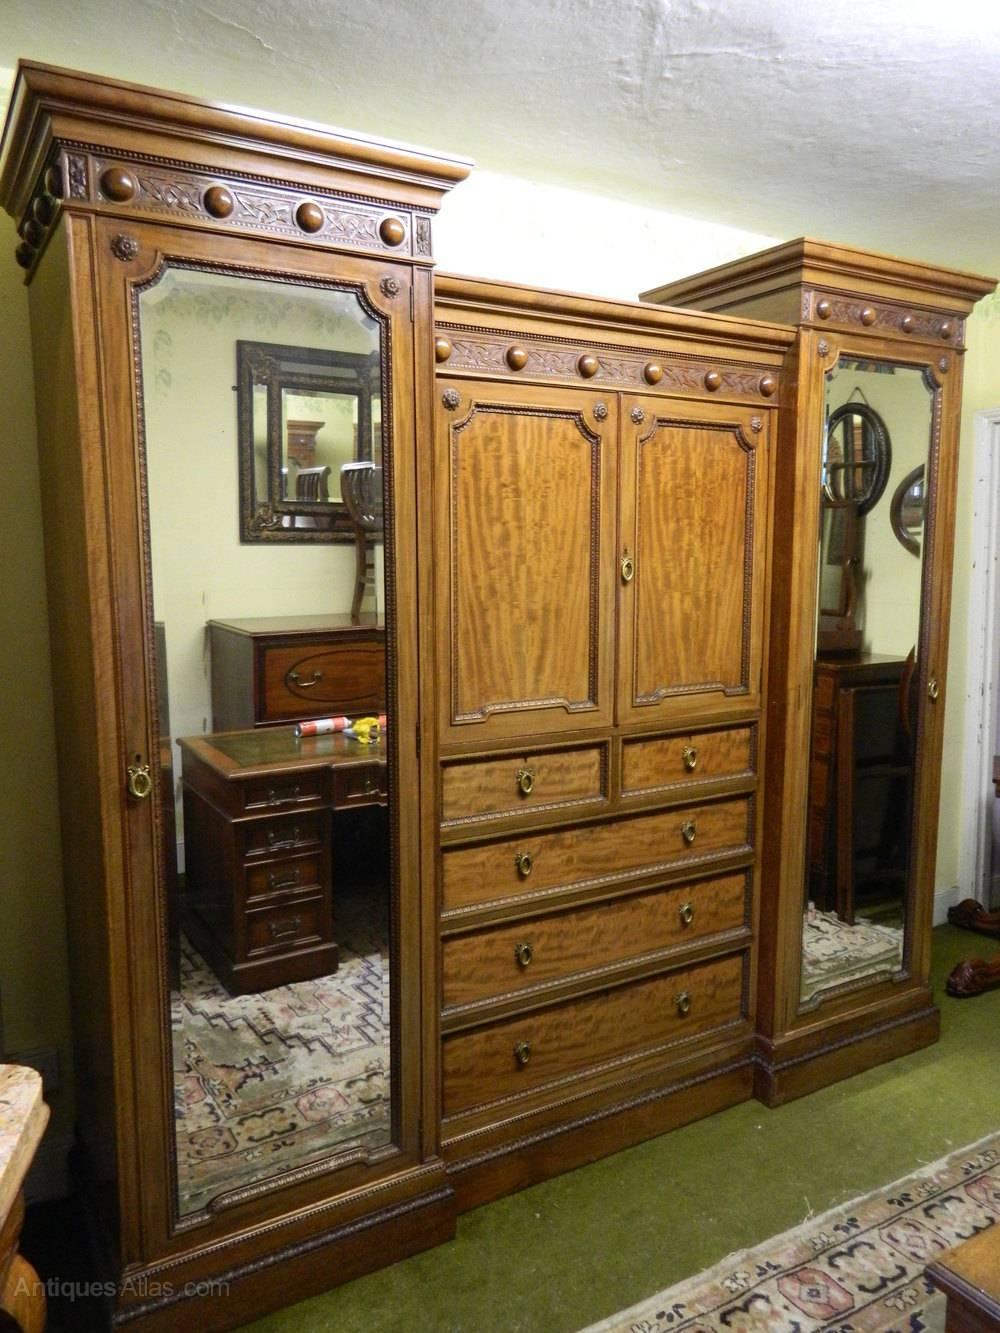 Mahogany Breakfront Wardrobe - Antiques Atlas regarding Breakfront Wardrobe (Image 13 of 30)